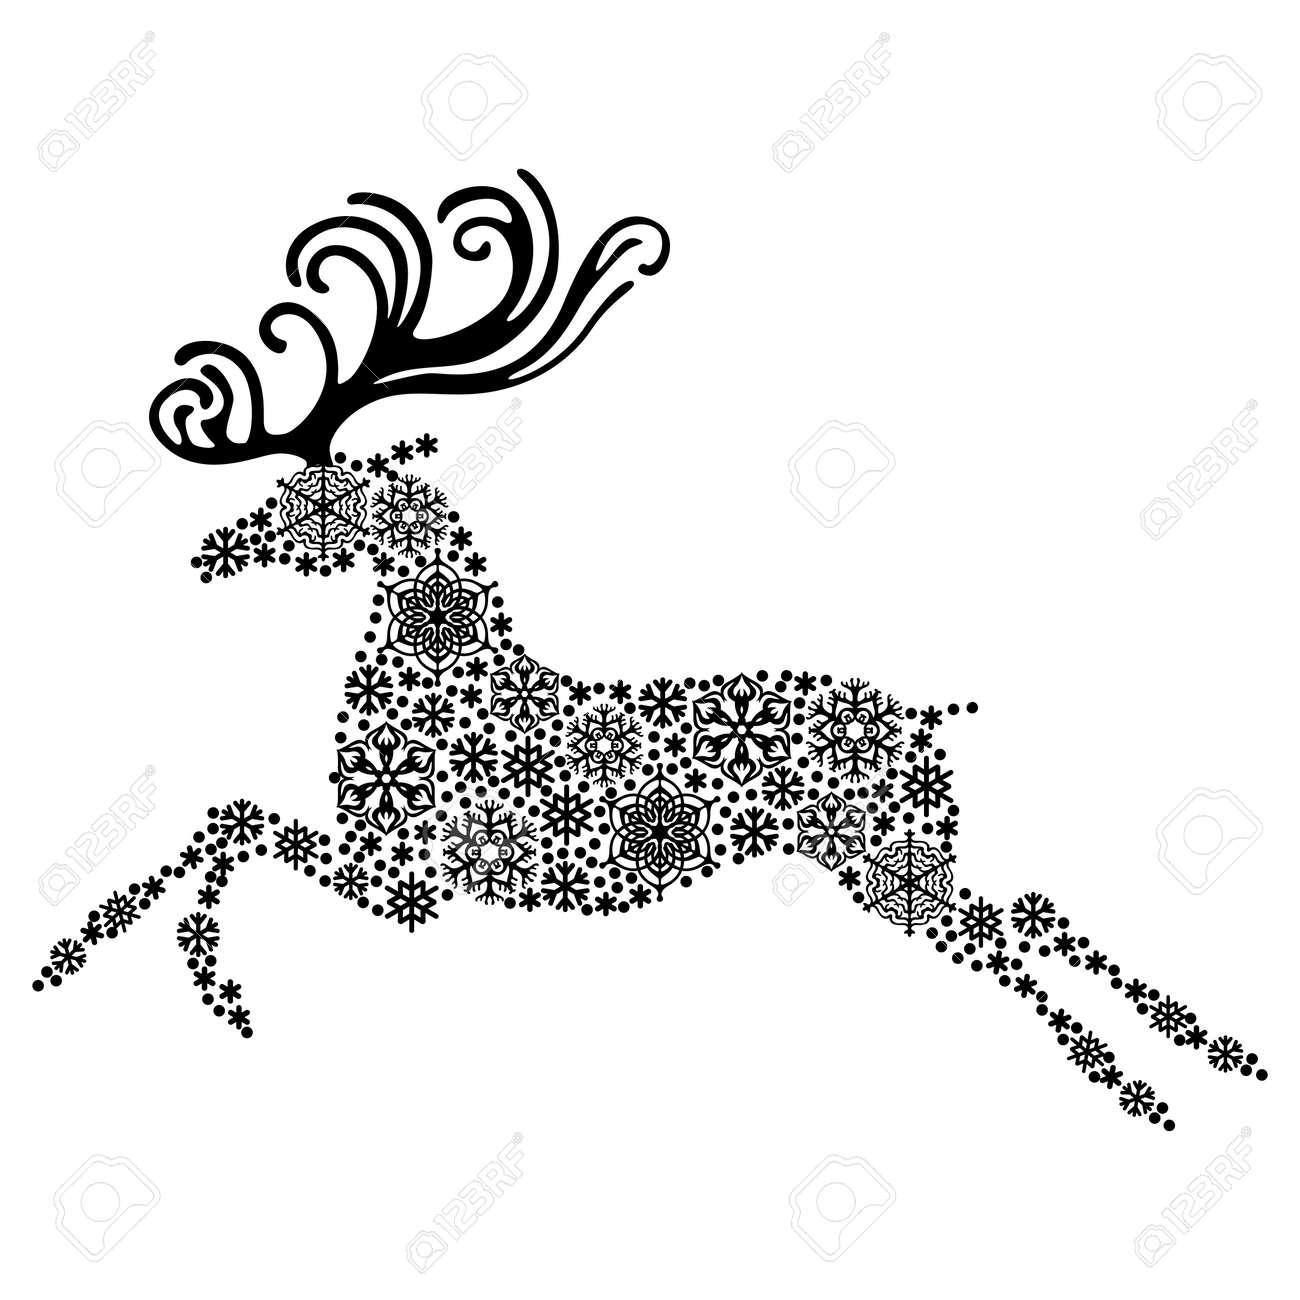 Christmas Reindeer Silhouette.Illustrations Of Christmas Reindeer Silhouette Consisting Of